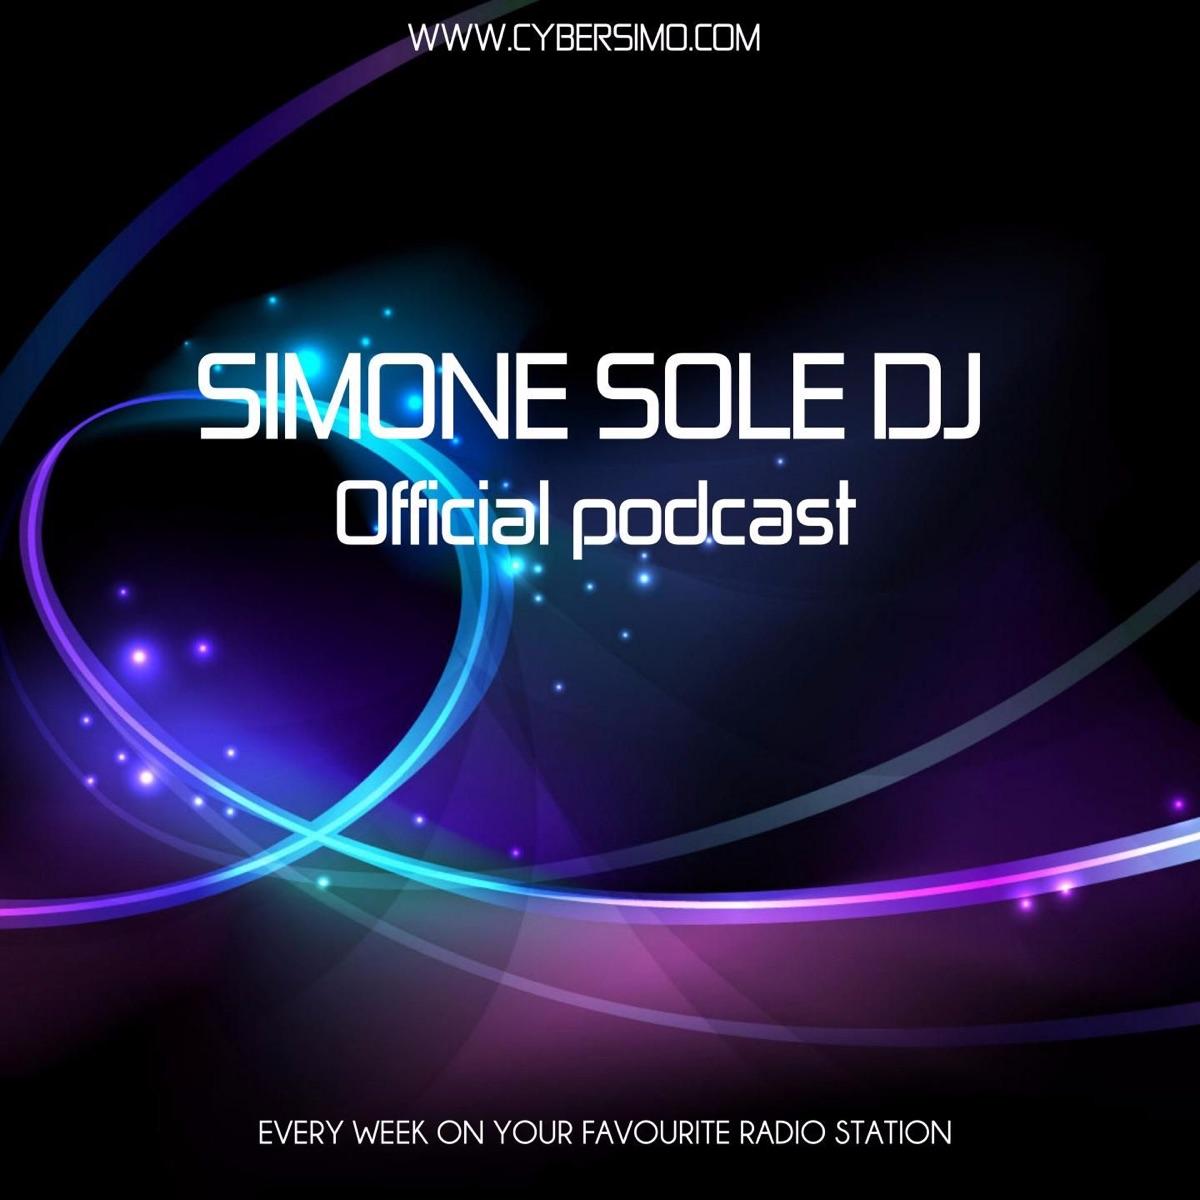 Simone Sole Dj Official